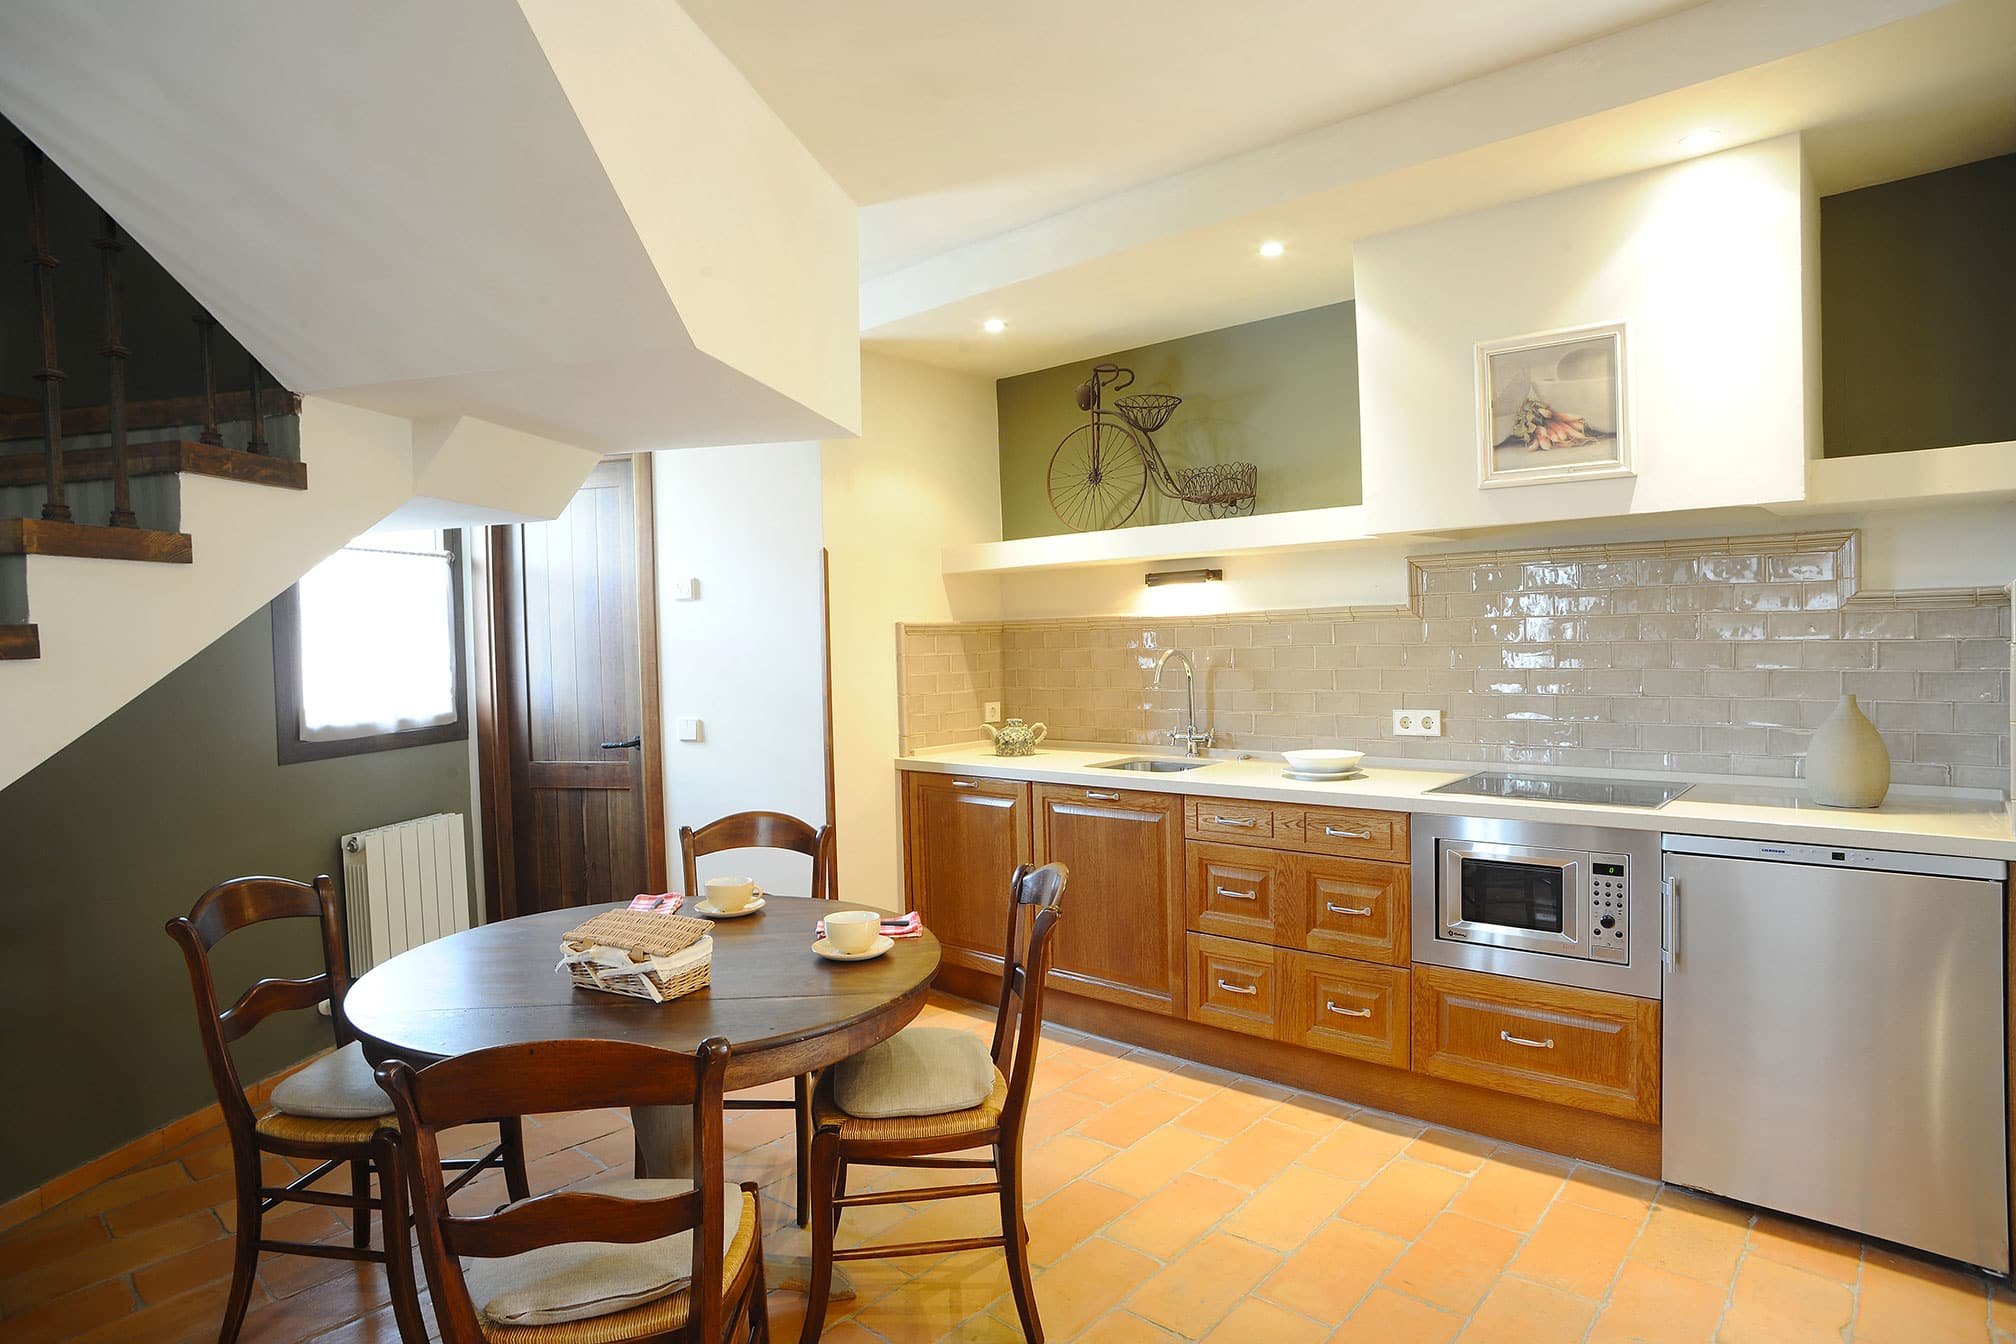 Apartamento Rural en Segovia - Las Cárcavas